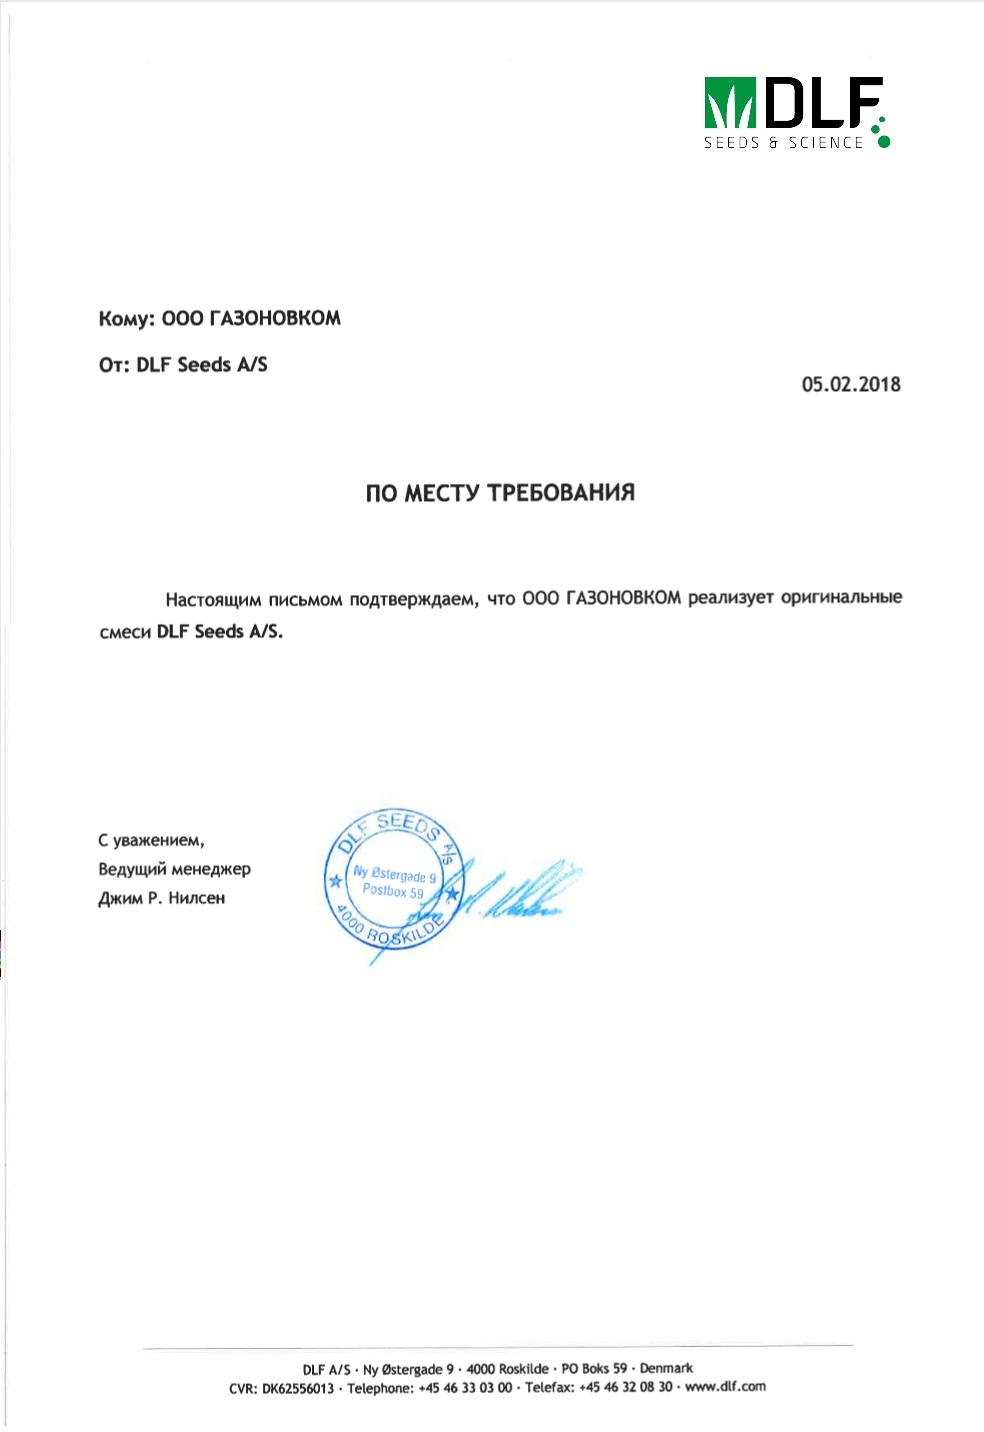 https://gazonov.com/images/upload/pismo-dlf-1.jpg